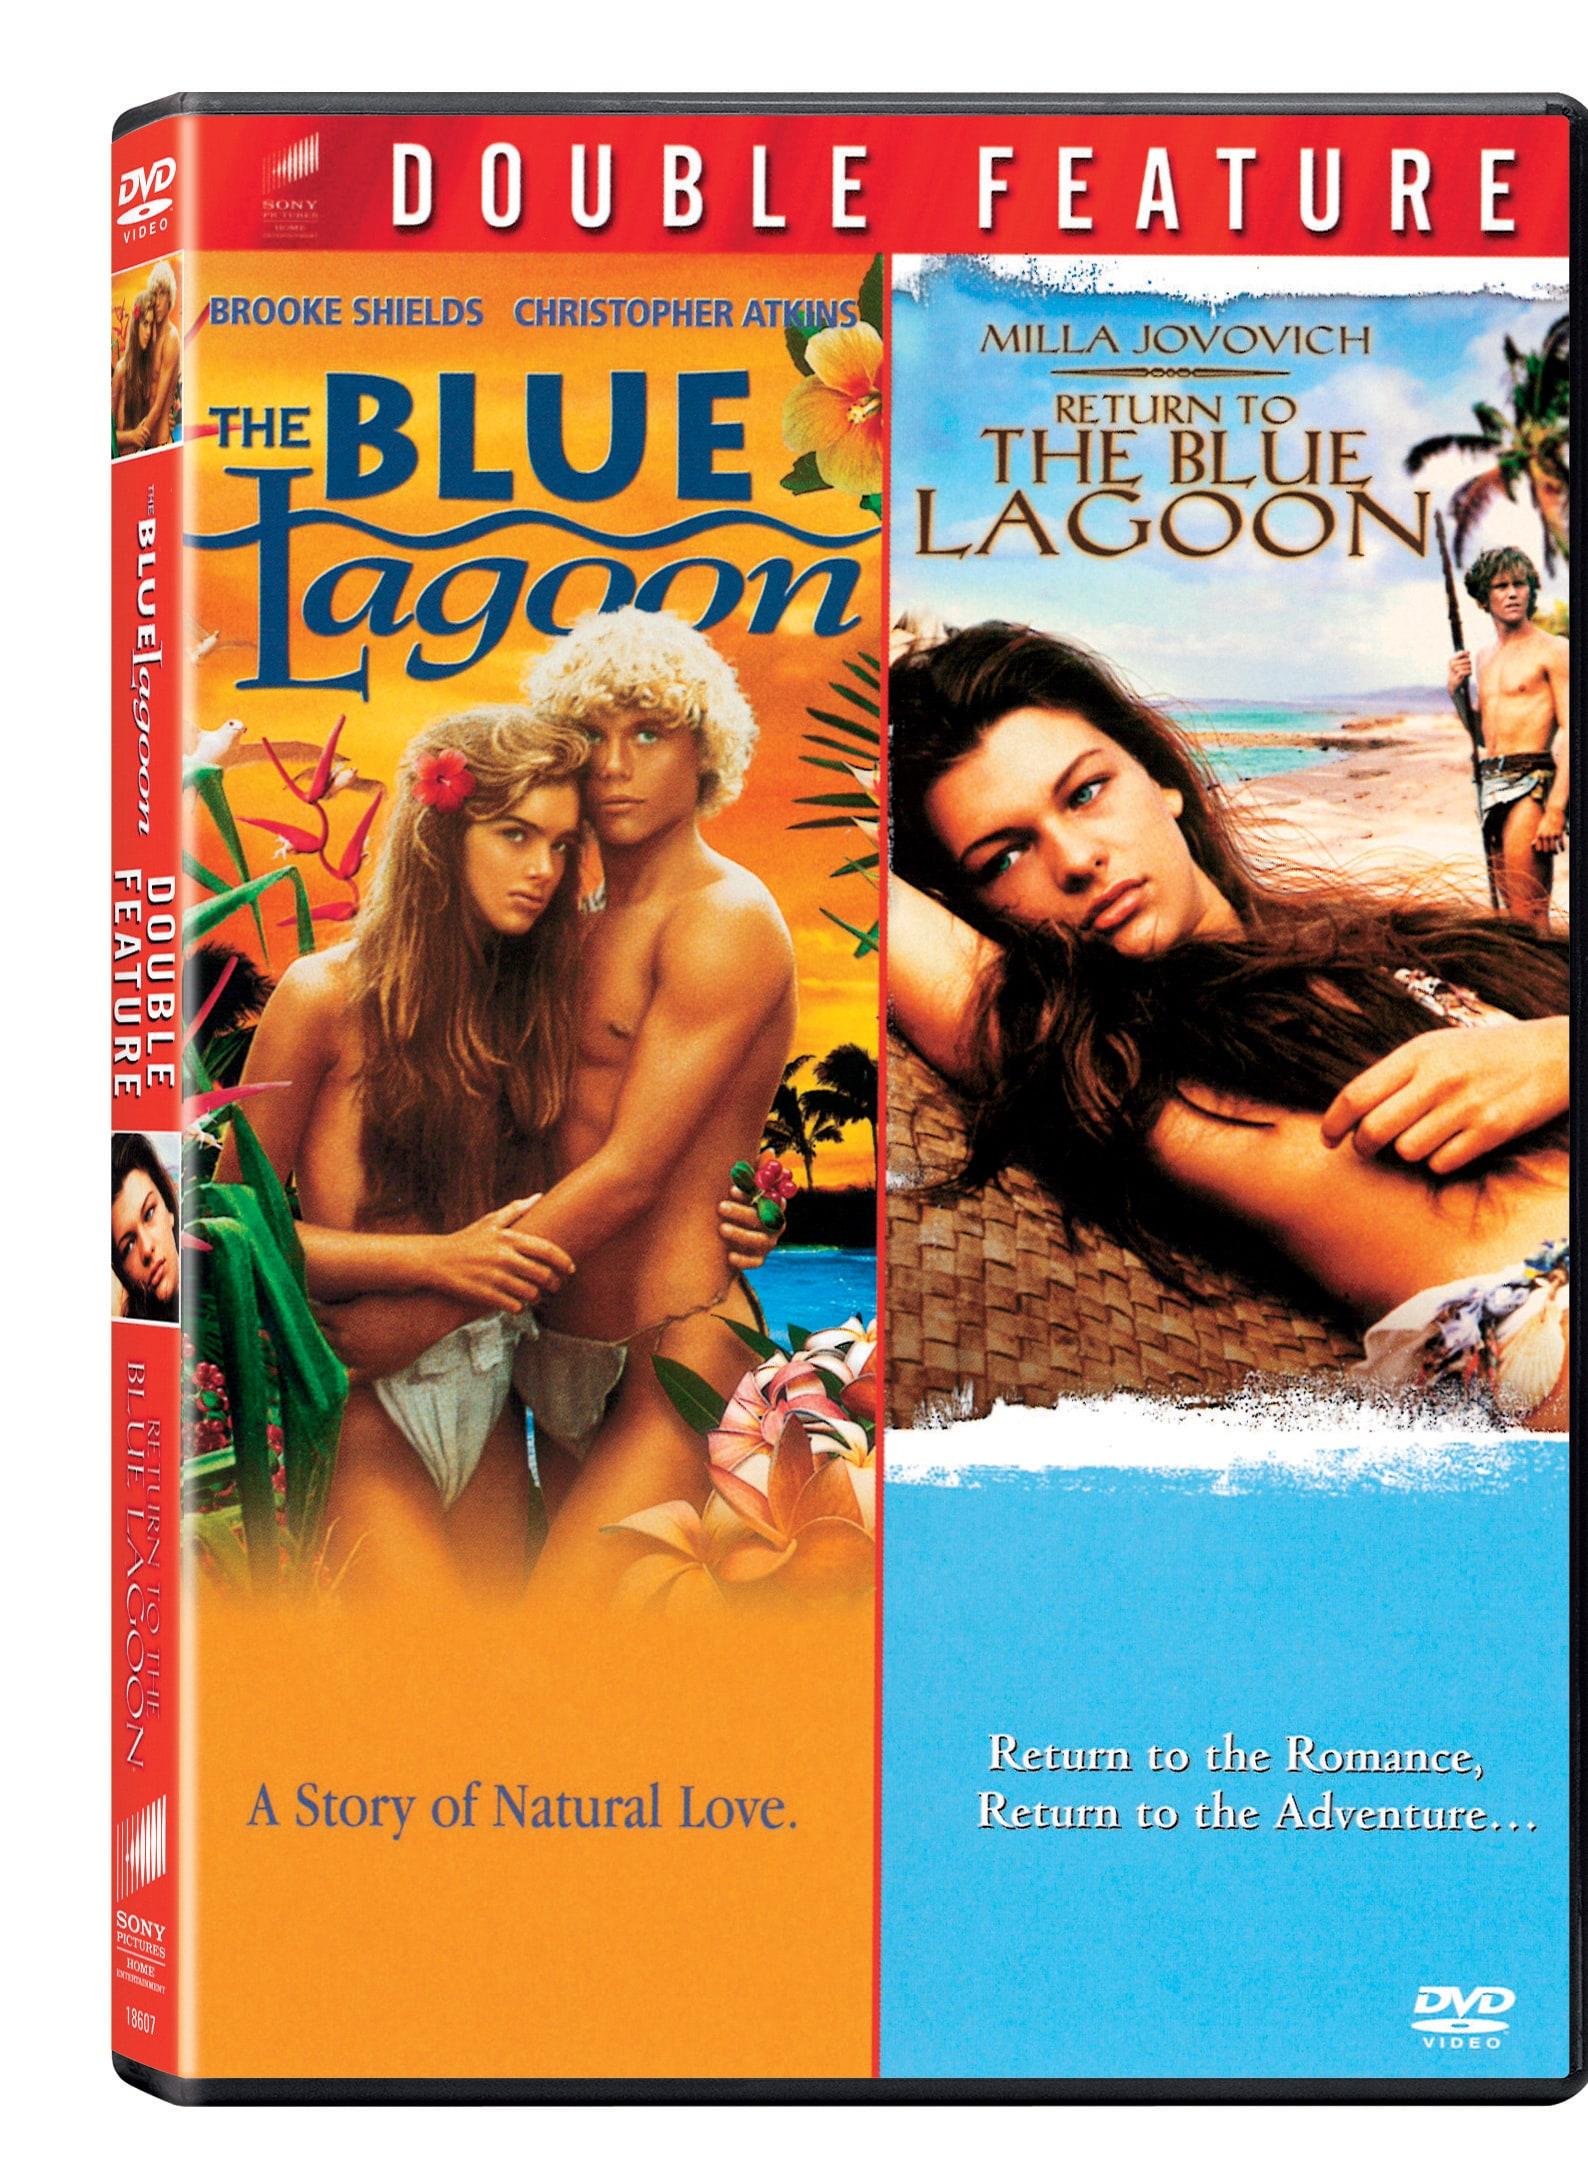 The Blue Lagoon Return To The Blue Lagoon Dvd Free